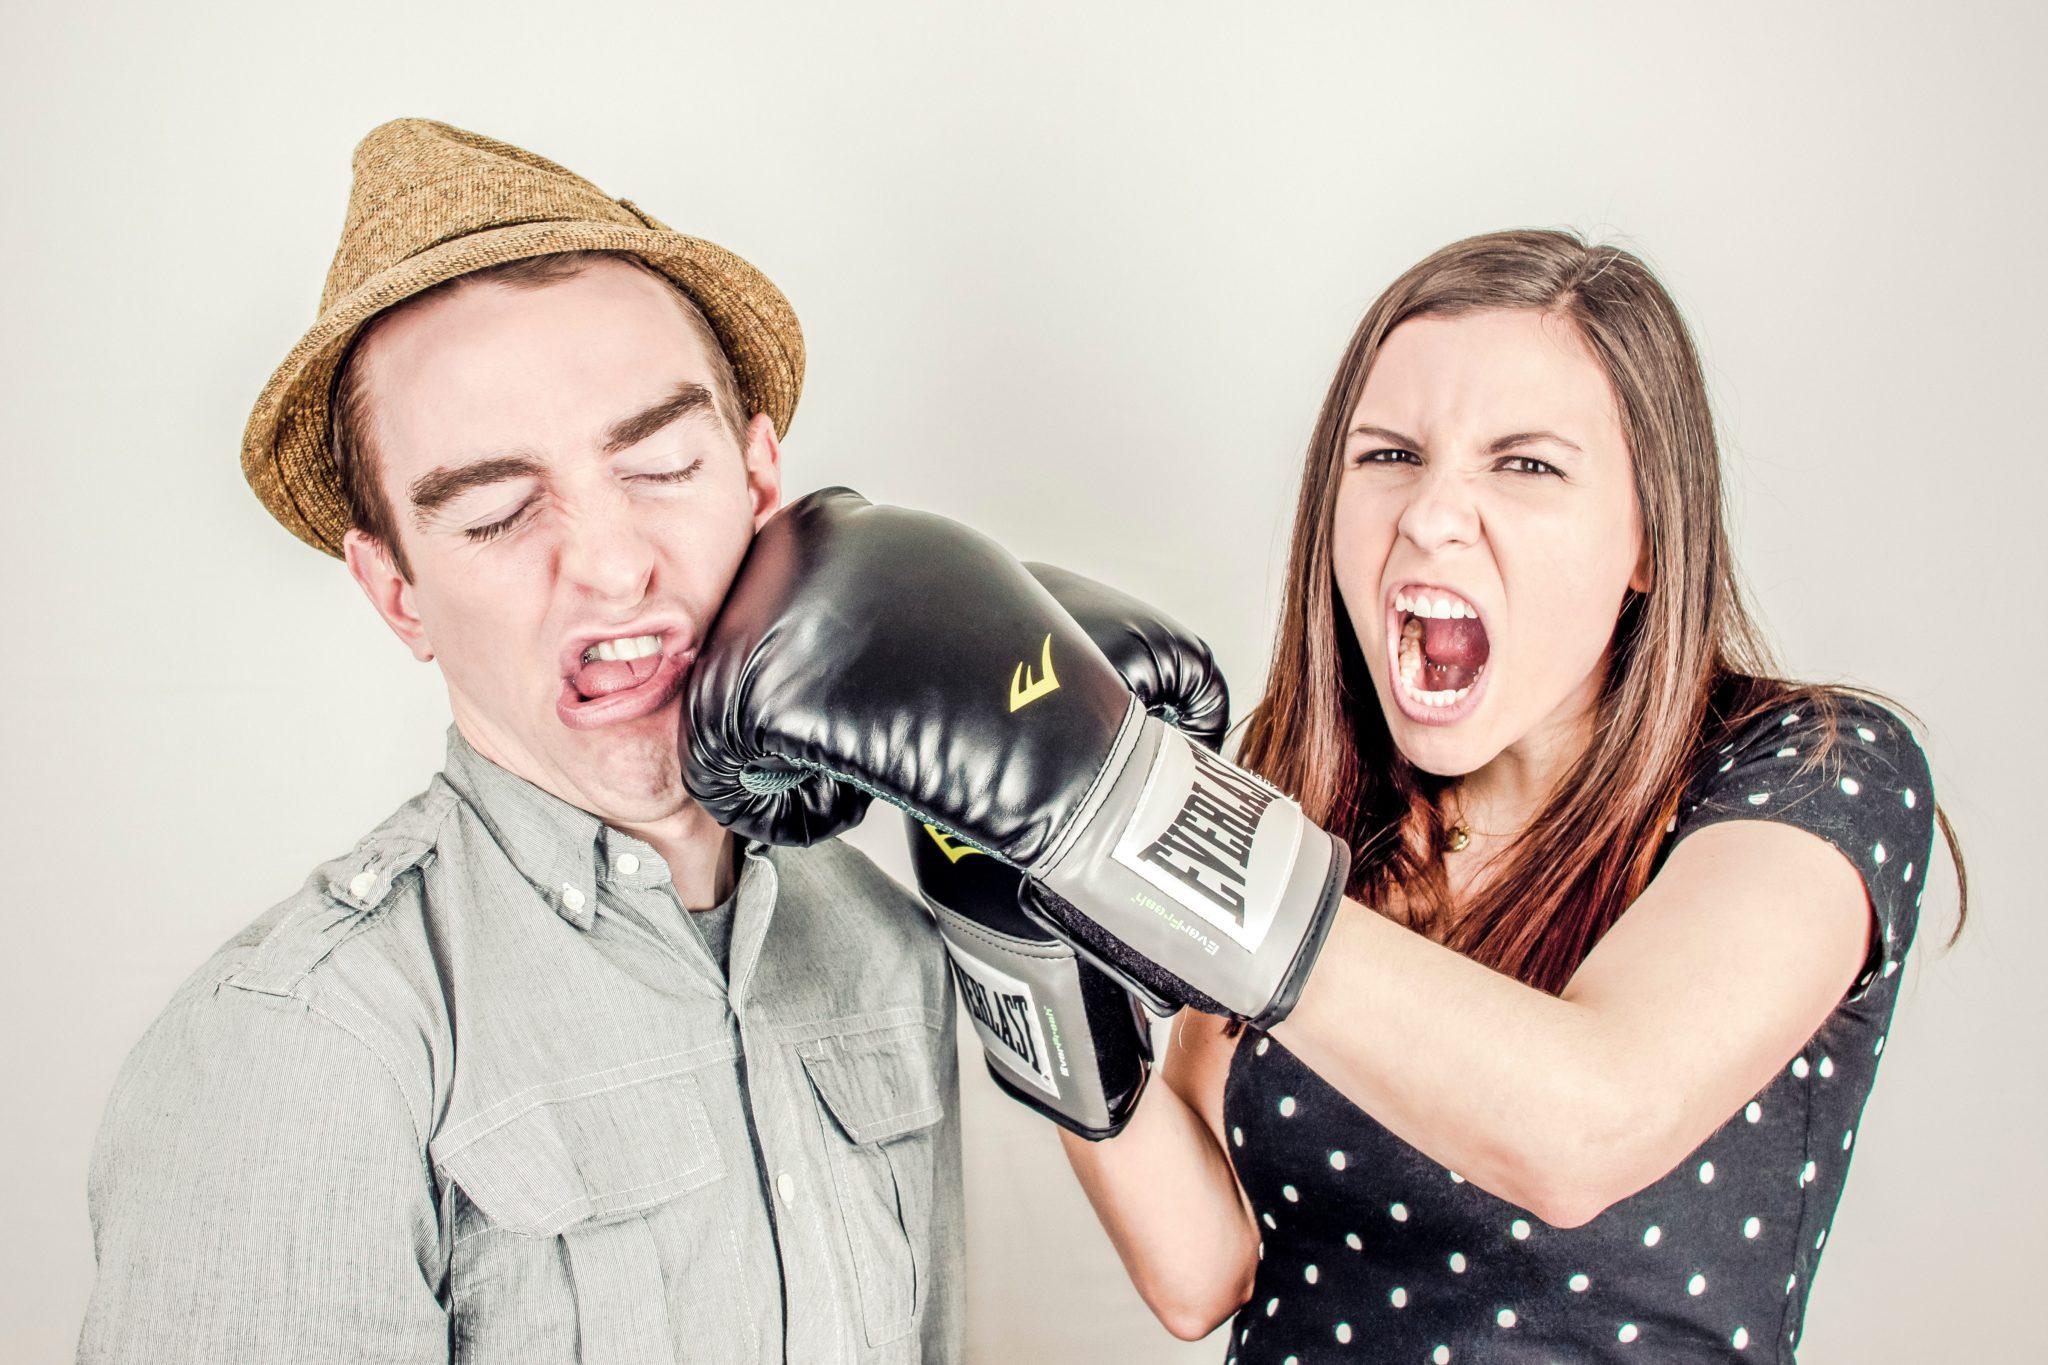 Backdoor bully's in recruitment